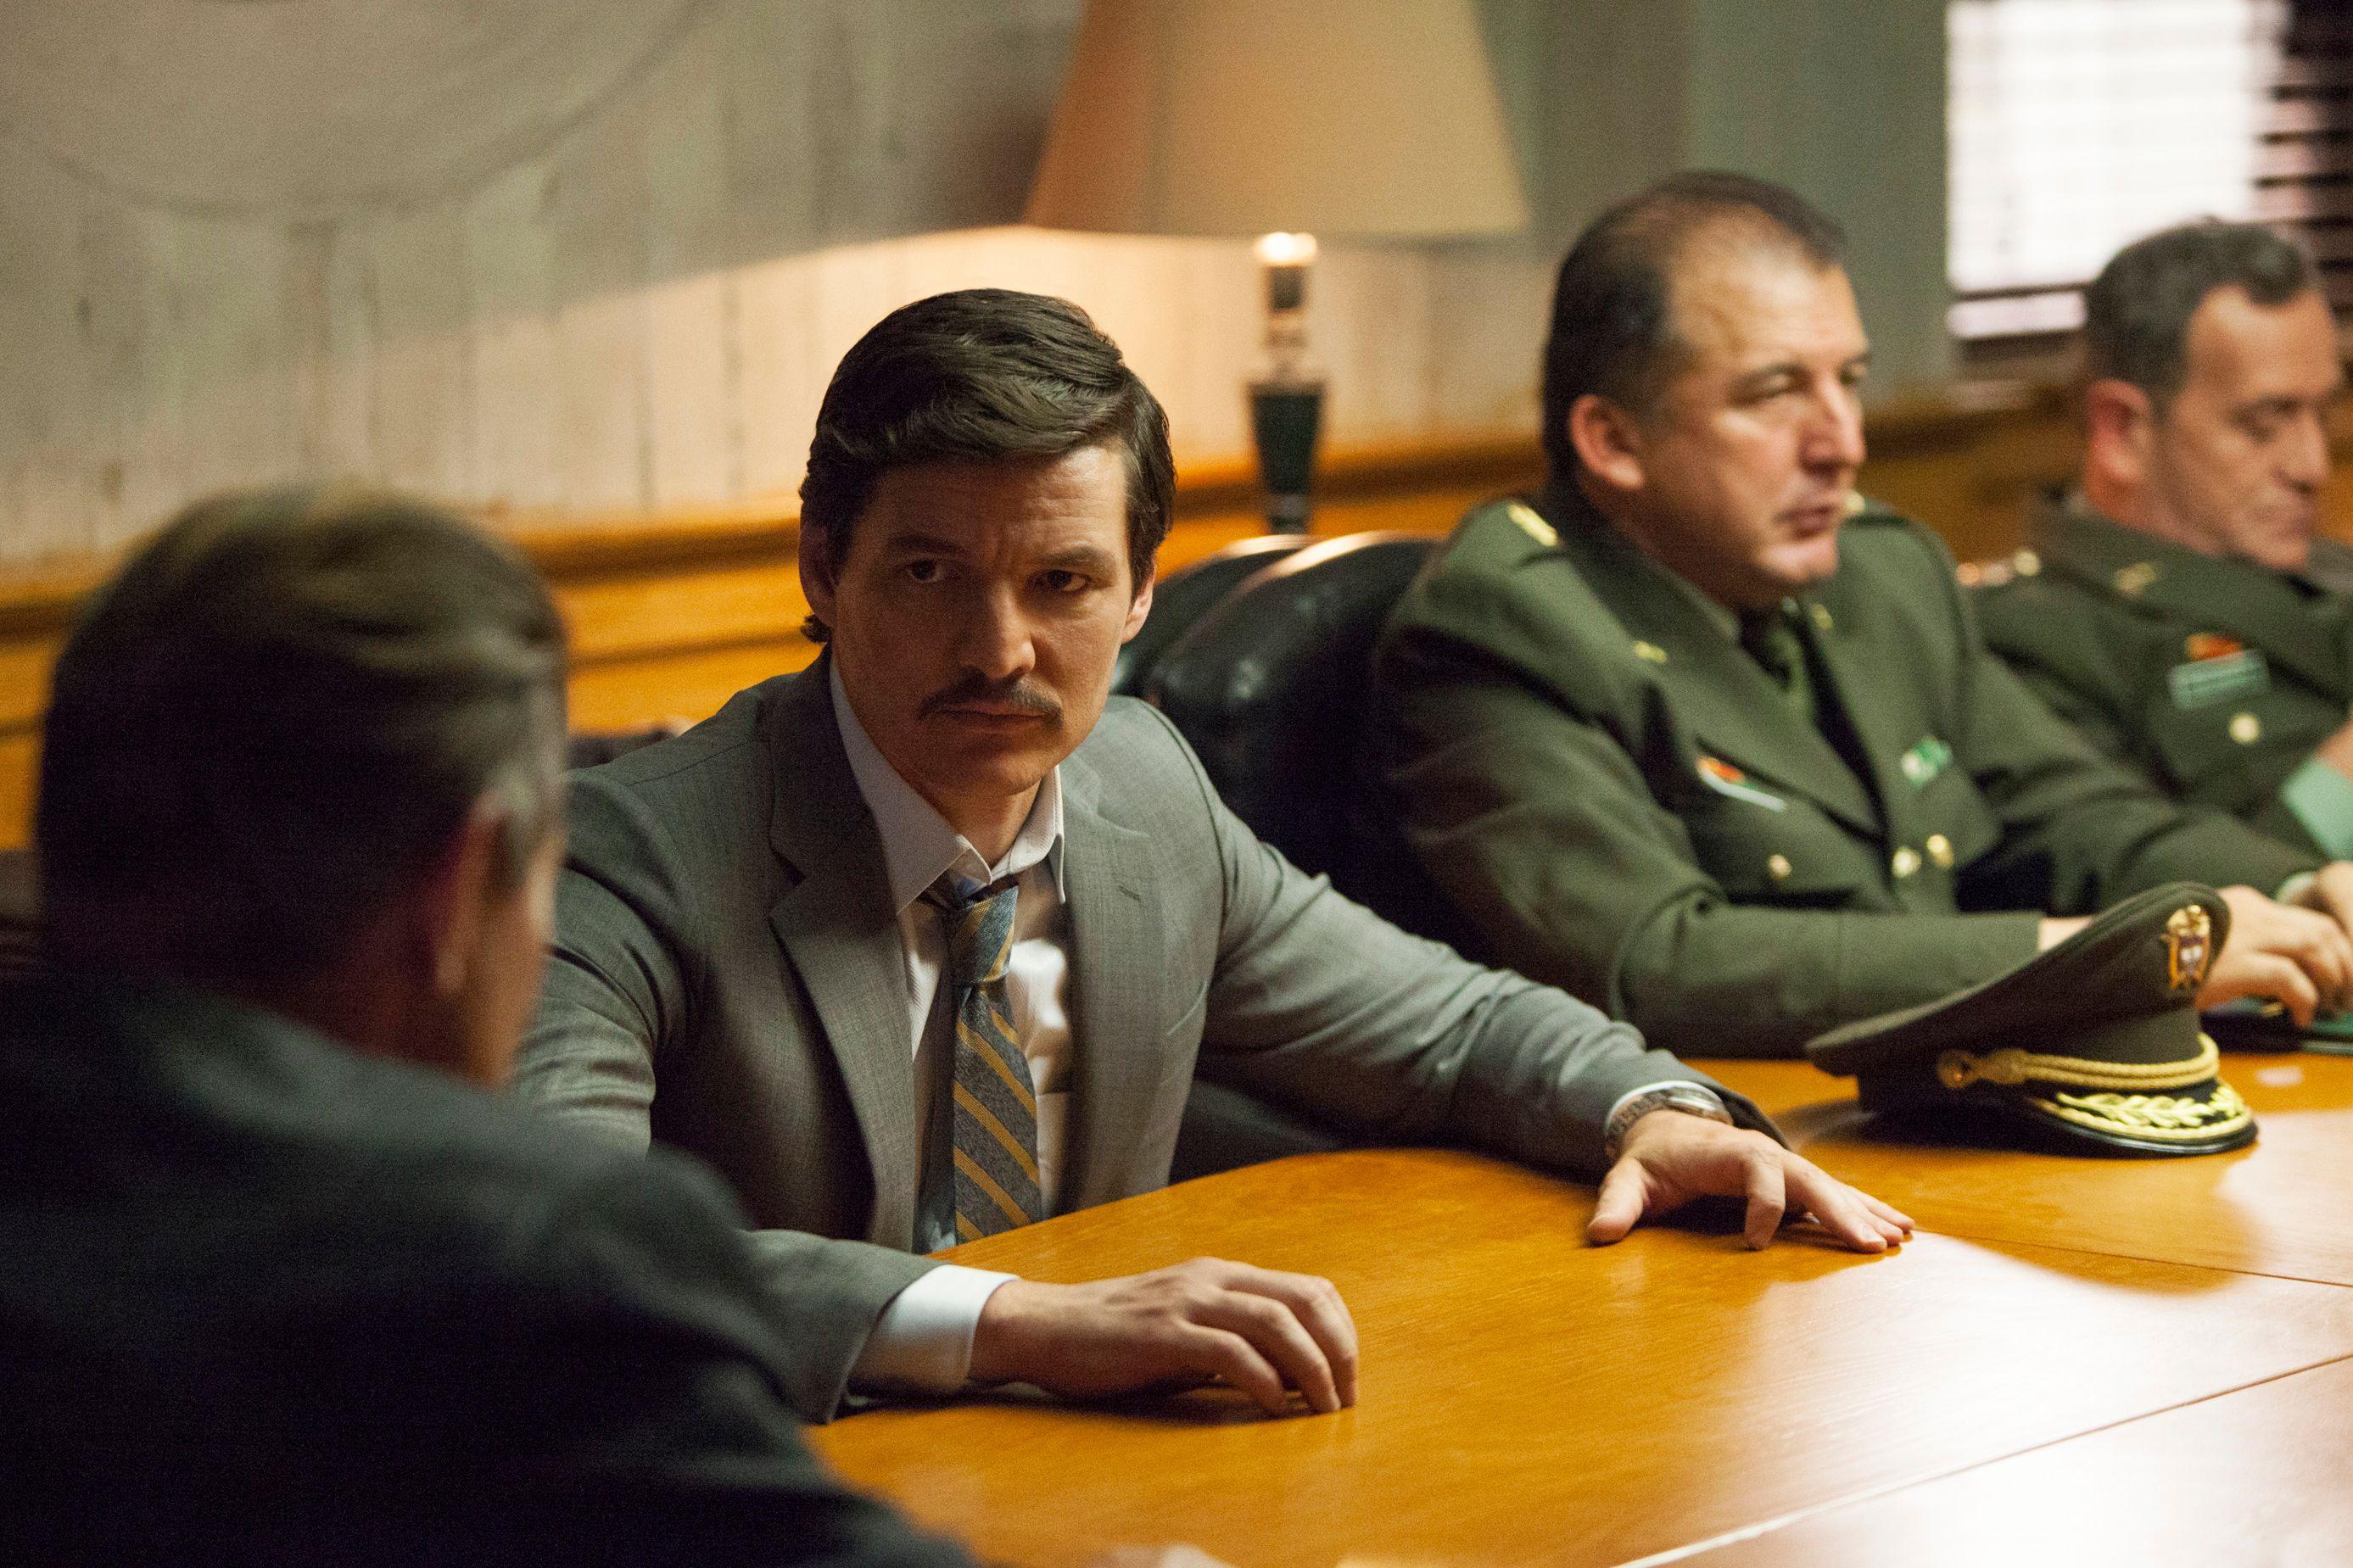 Narcos Season 3 Review: Netflix's Drama Gets a New Cartel